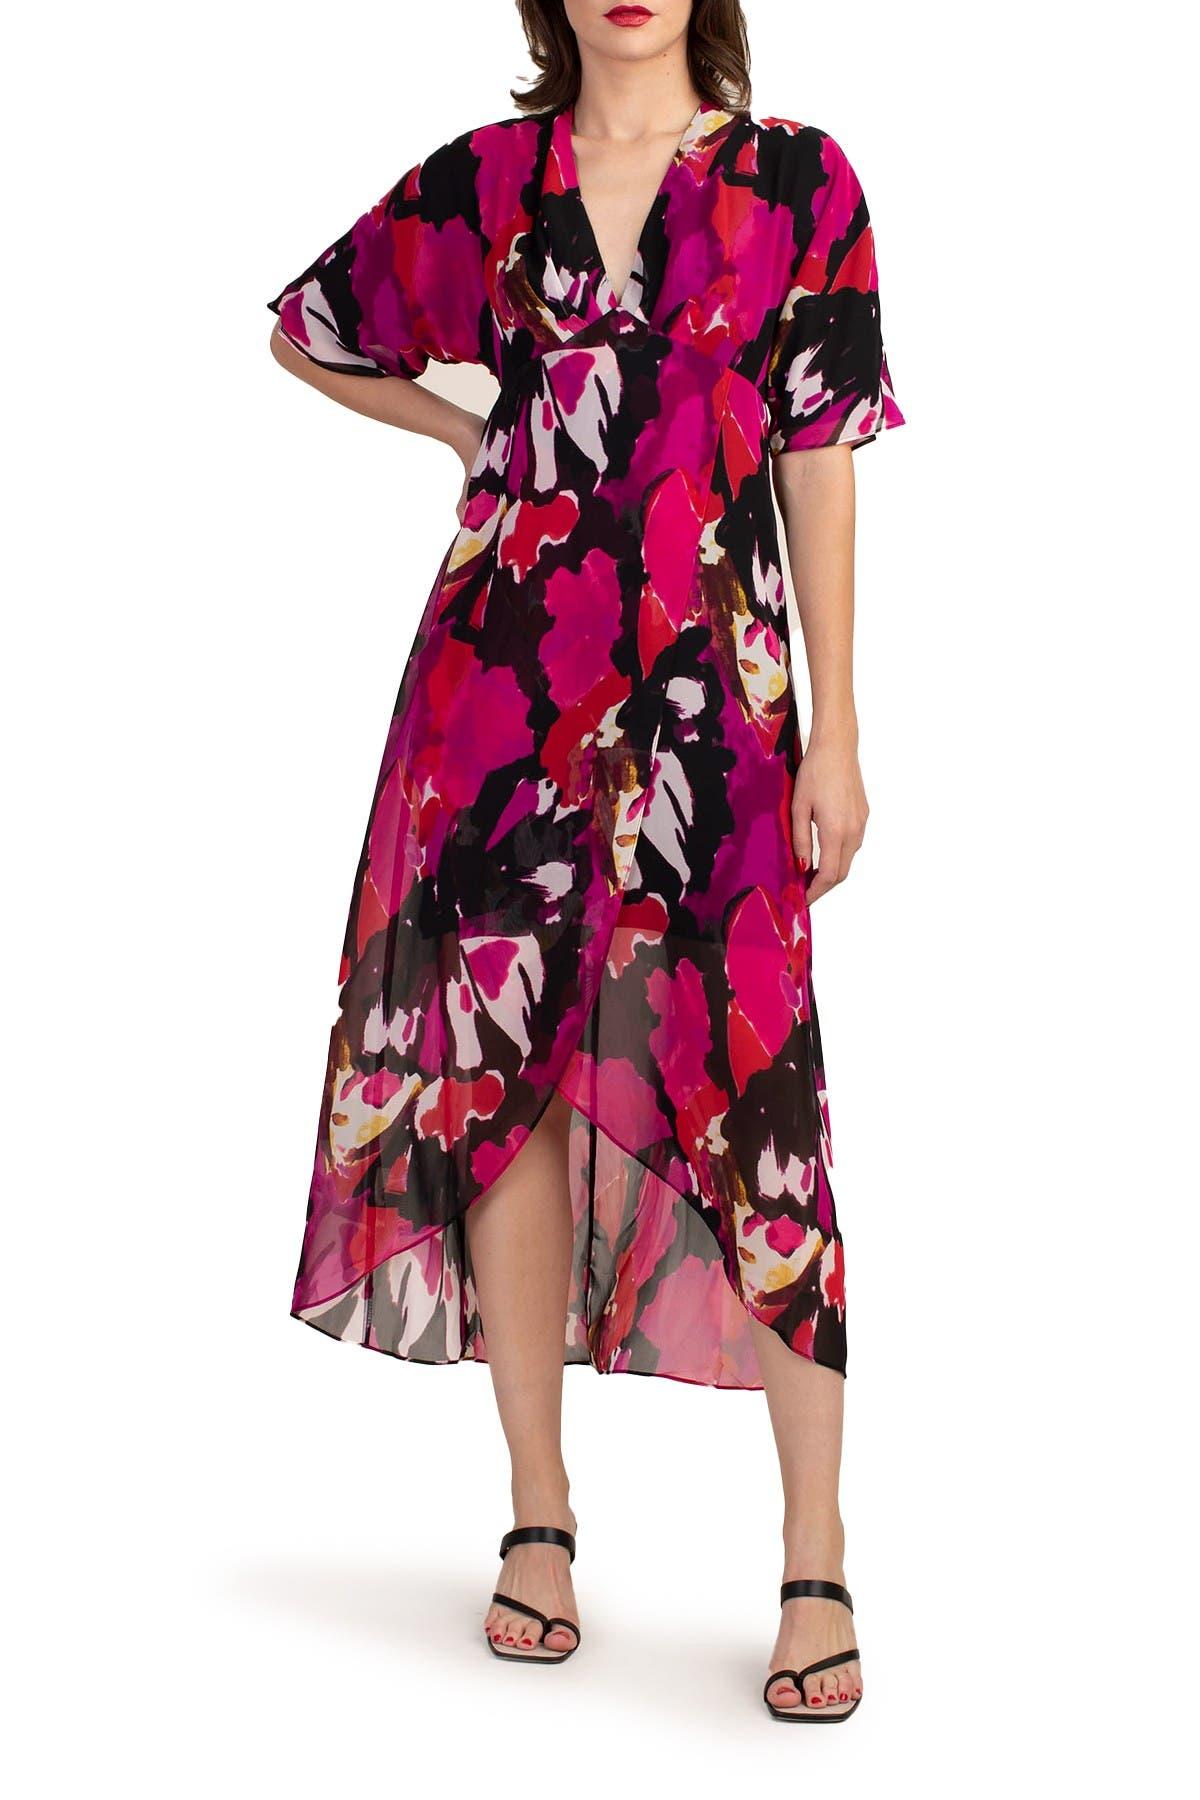 Image of Trina Turk Hana Printed High/Low Hem Dress